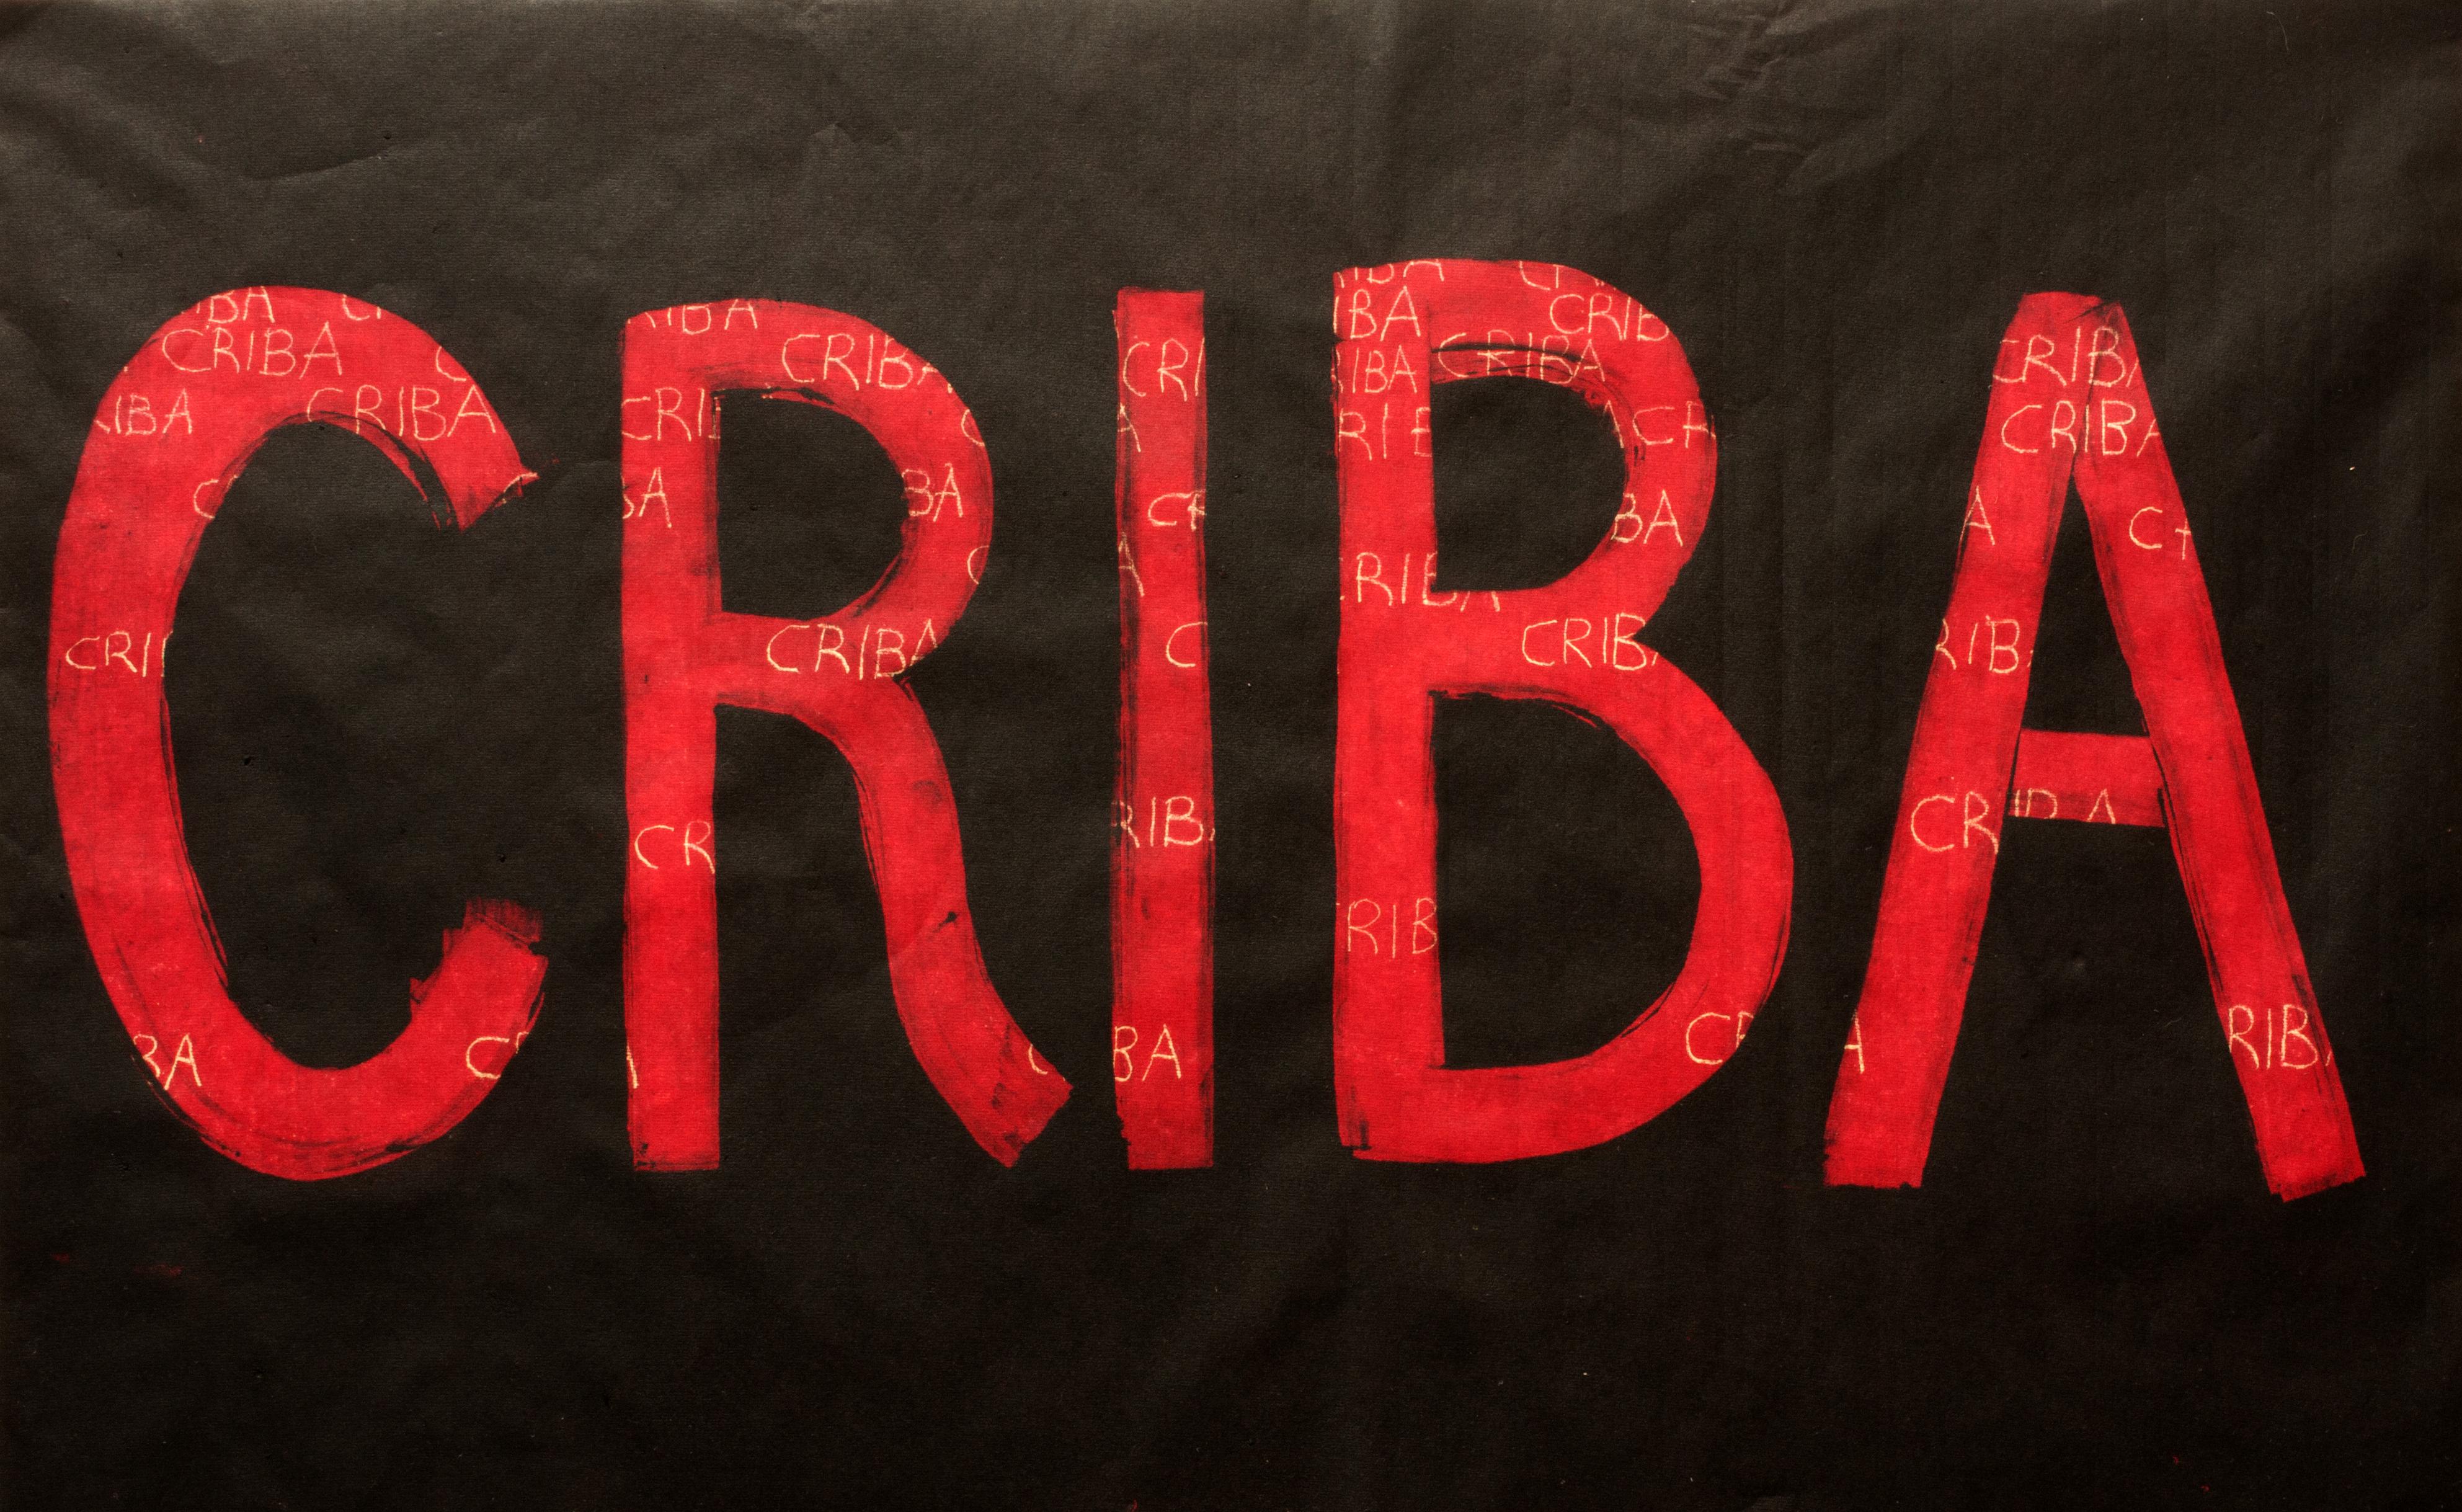 Monoprint CRIBA, Laura Lio, December 2020